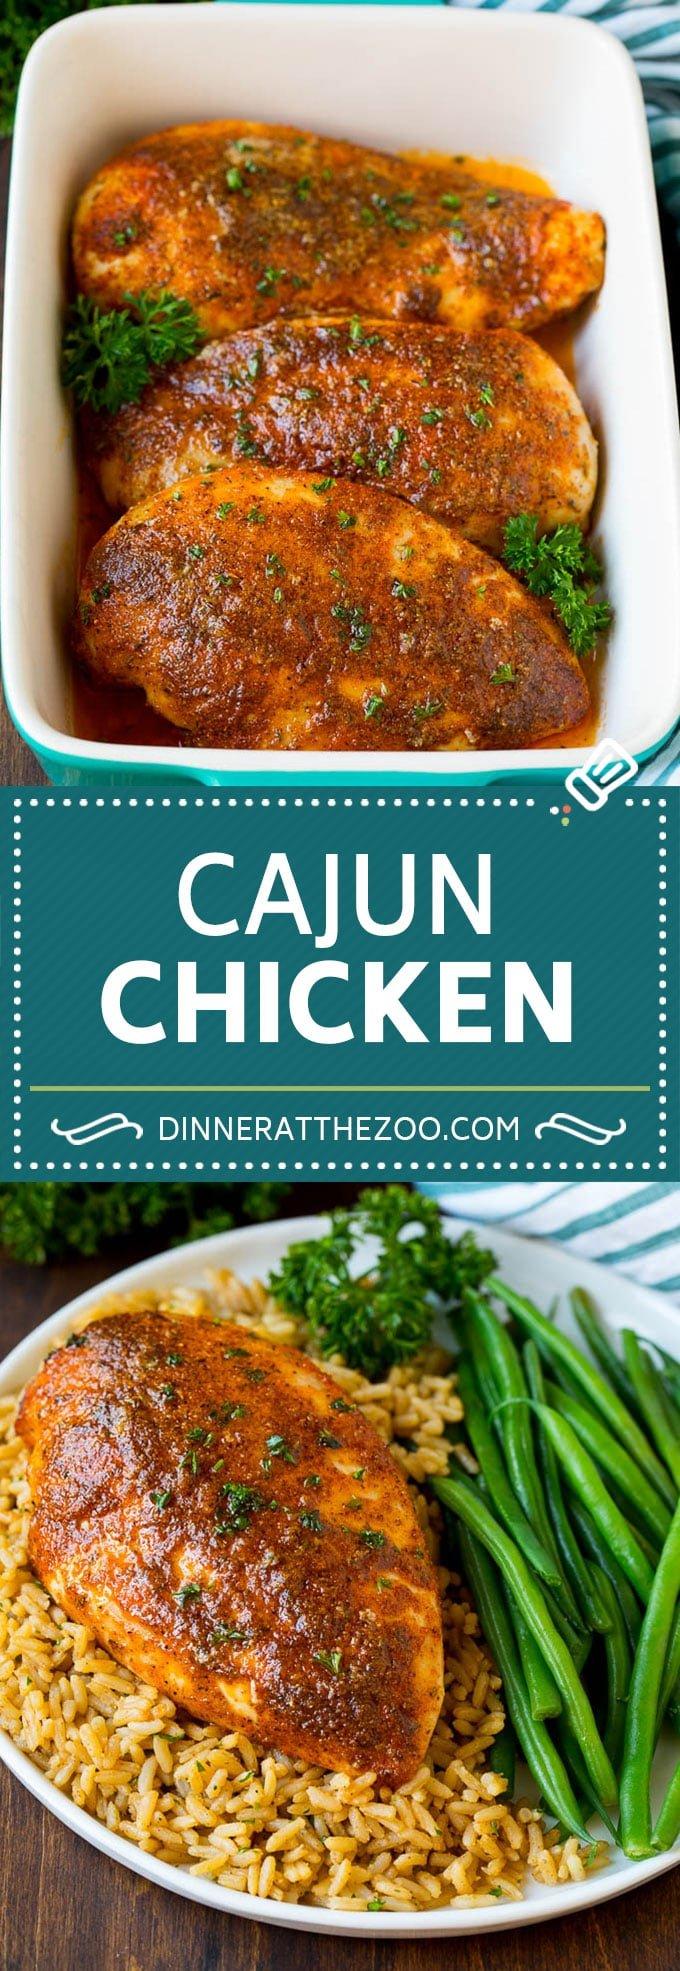 Cajun Chicken Recipe #cajun #chicken #dinneratthezoo